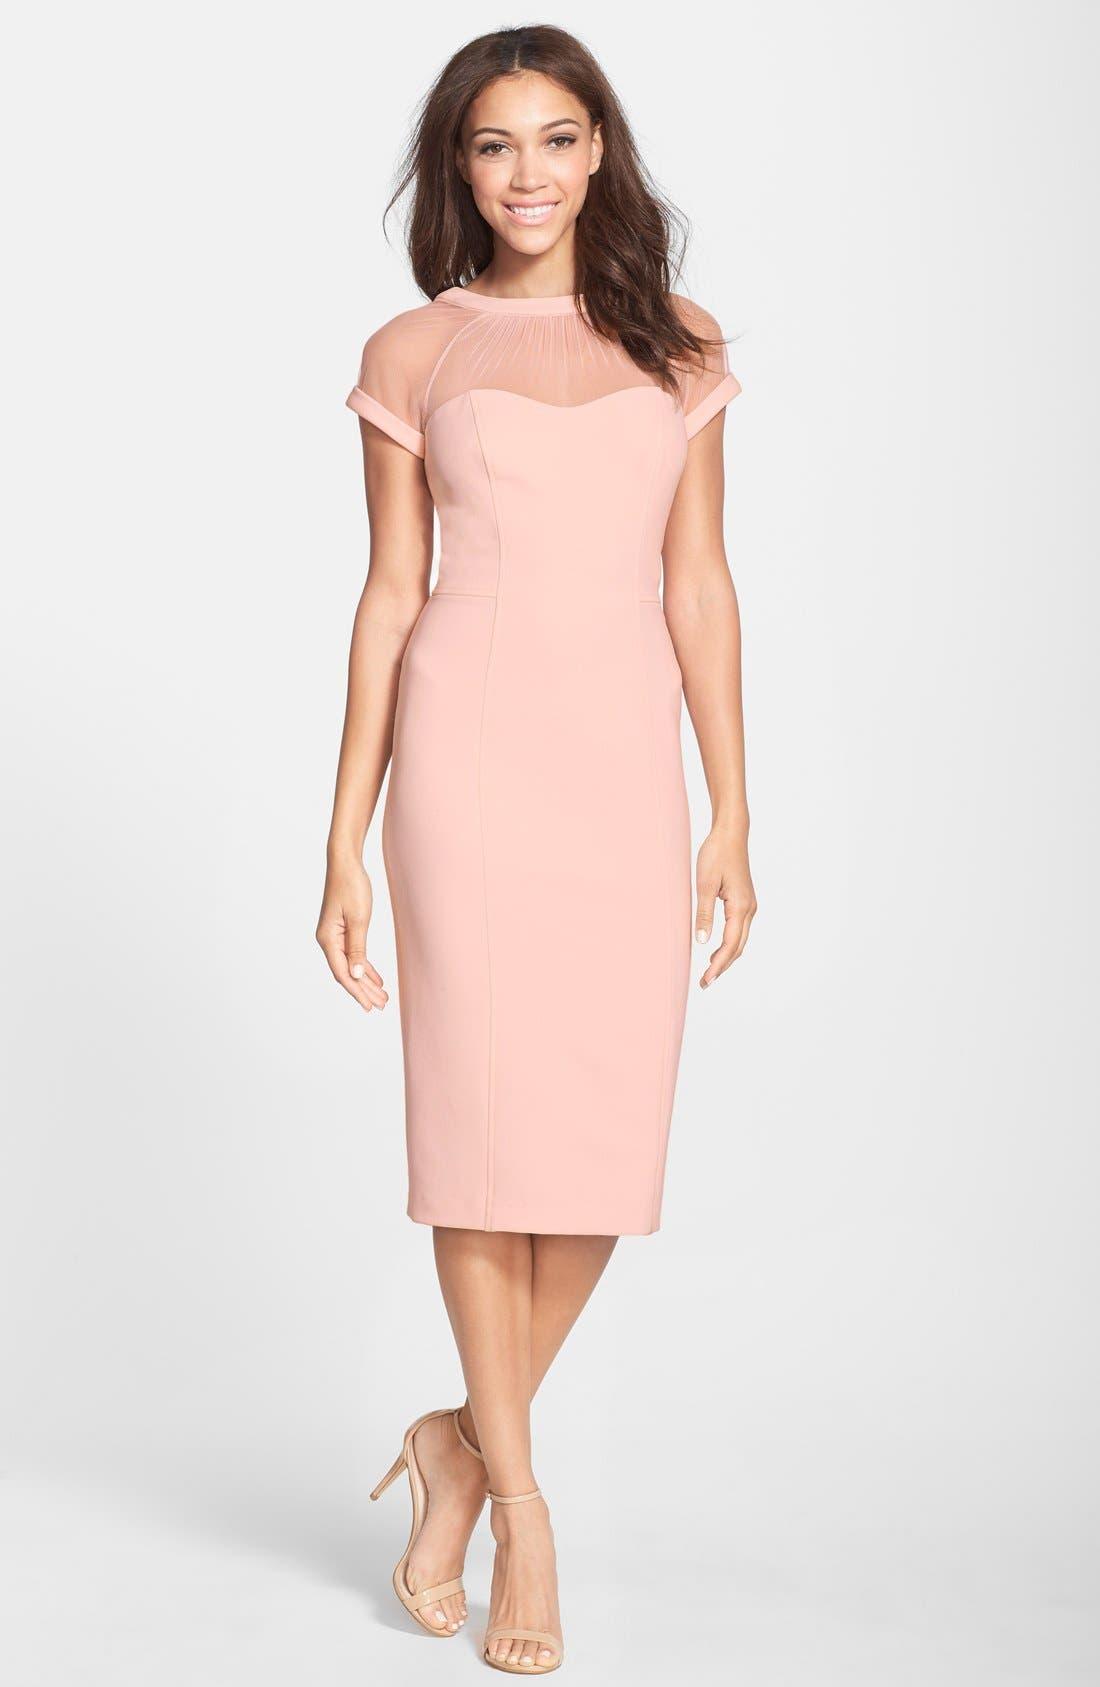 Alternate Image 1 Selected - Maggy London Illusion Yoke Crepe Sheath Dress (Regular & Petite)